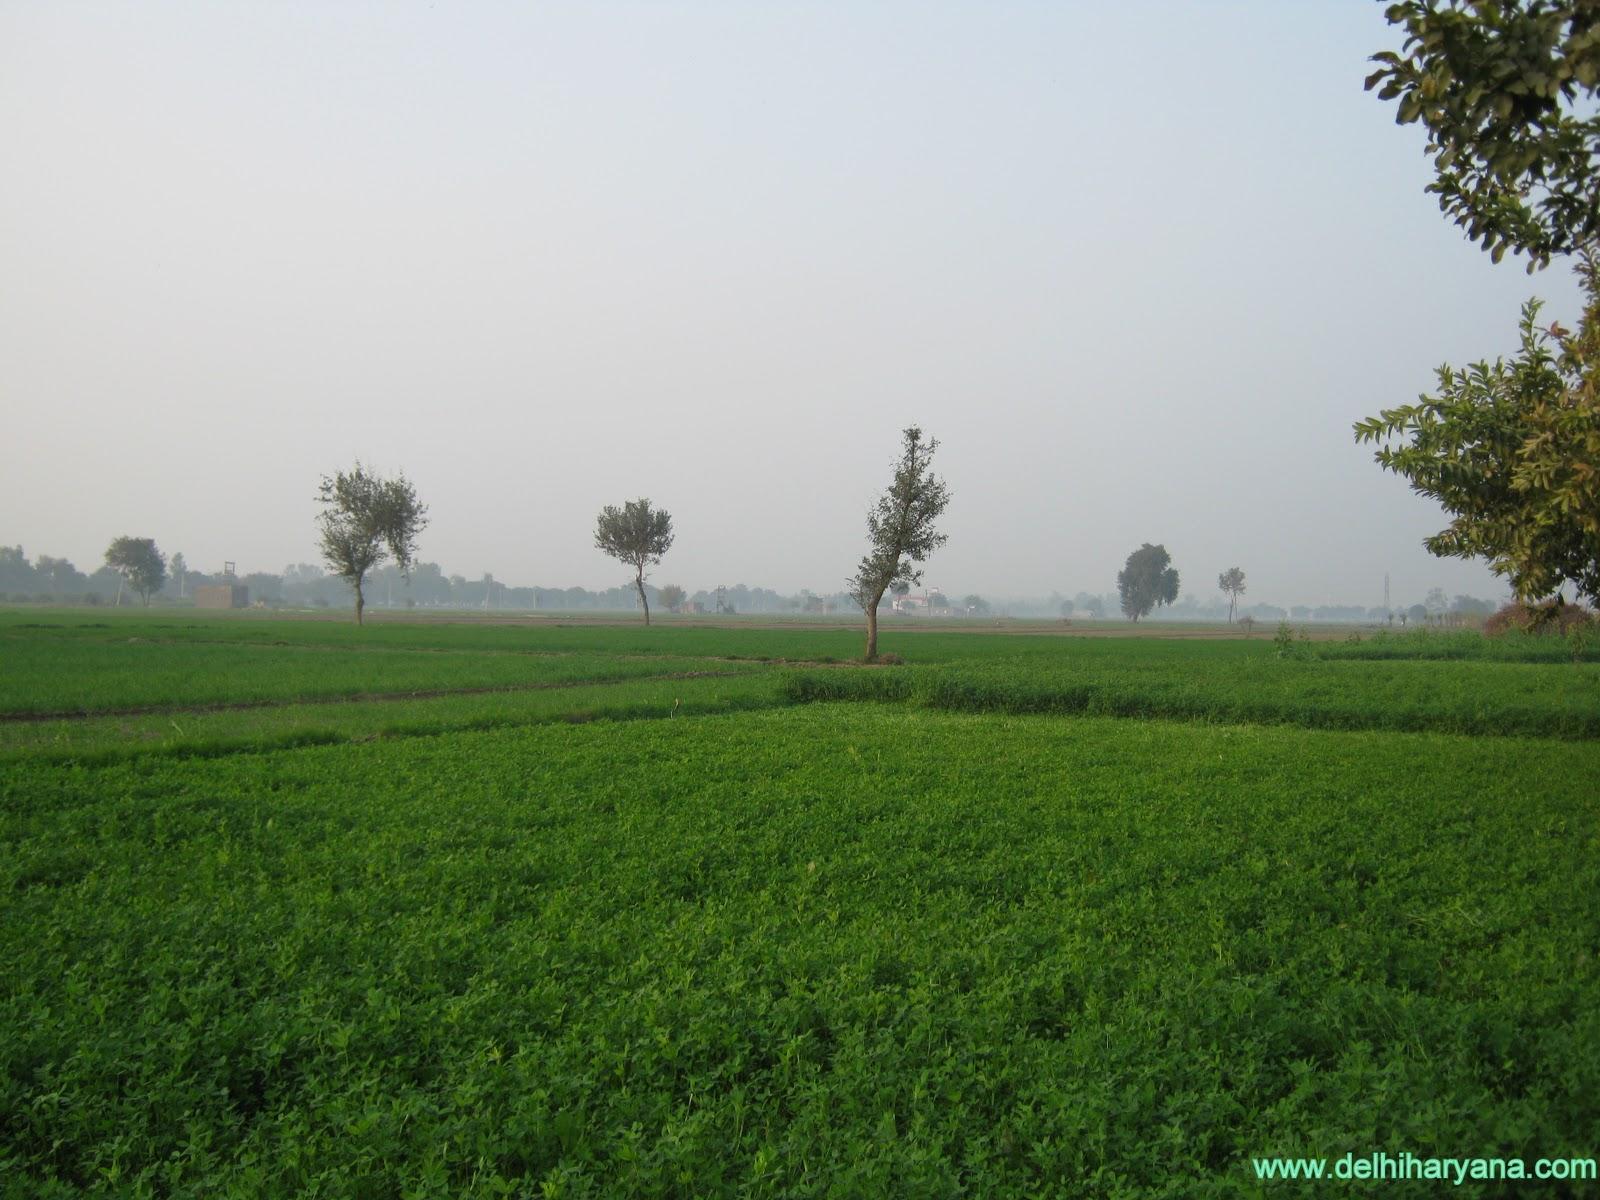 http://4.bp.blogspot.com/-5Y6-RpxpWOY/TpFoTiqgnfI/AAAAAAAAFMo/B8KZAD_vxVc/s1600/Green_farm_of_Haryana.jpg